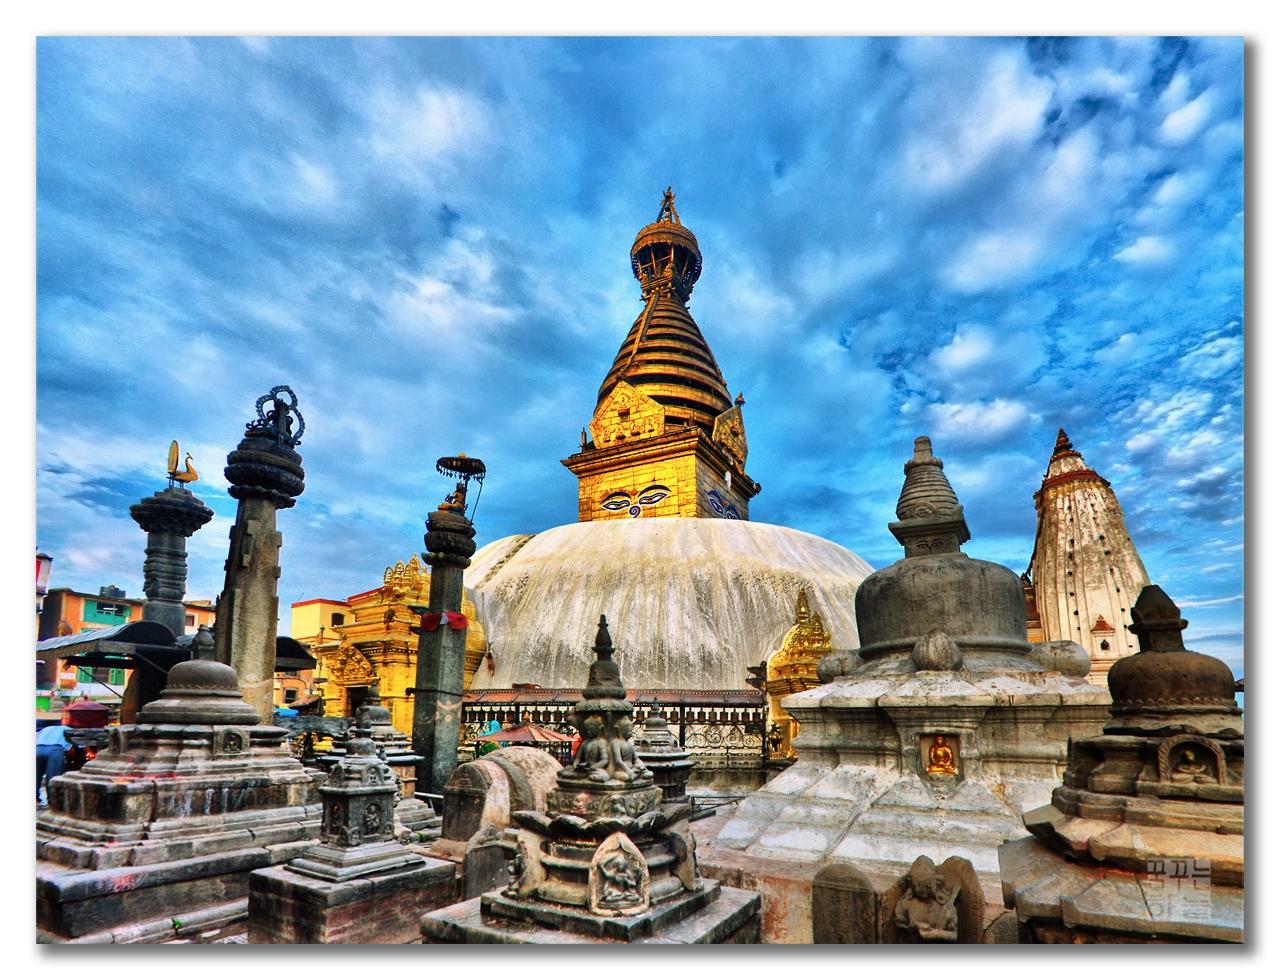 http://4.bp.blogspot.com/-7Dt519bqzAE/Tm743MqLksI/AAAAAAAAJp0/FCnal-unNXk/s1600/free-desktop-wallpaper-Nepal-Kathmandu-HDR-TheDreamSky.jpg